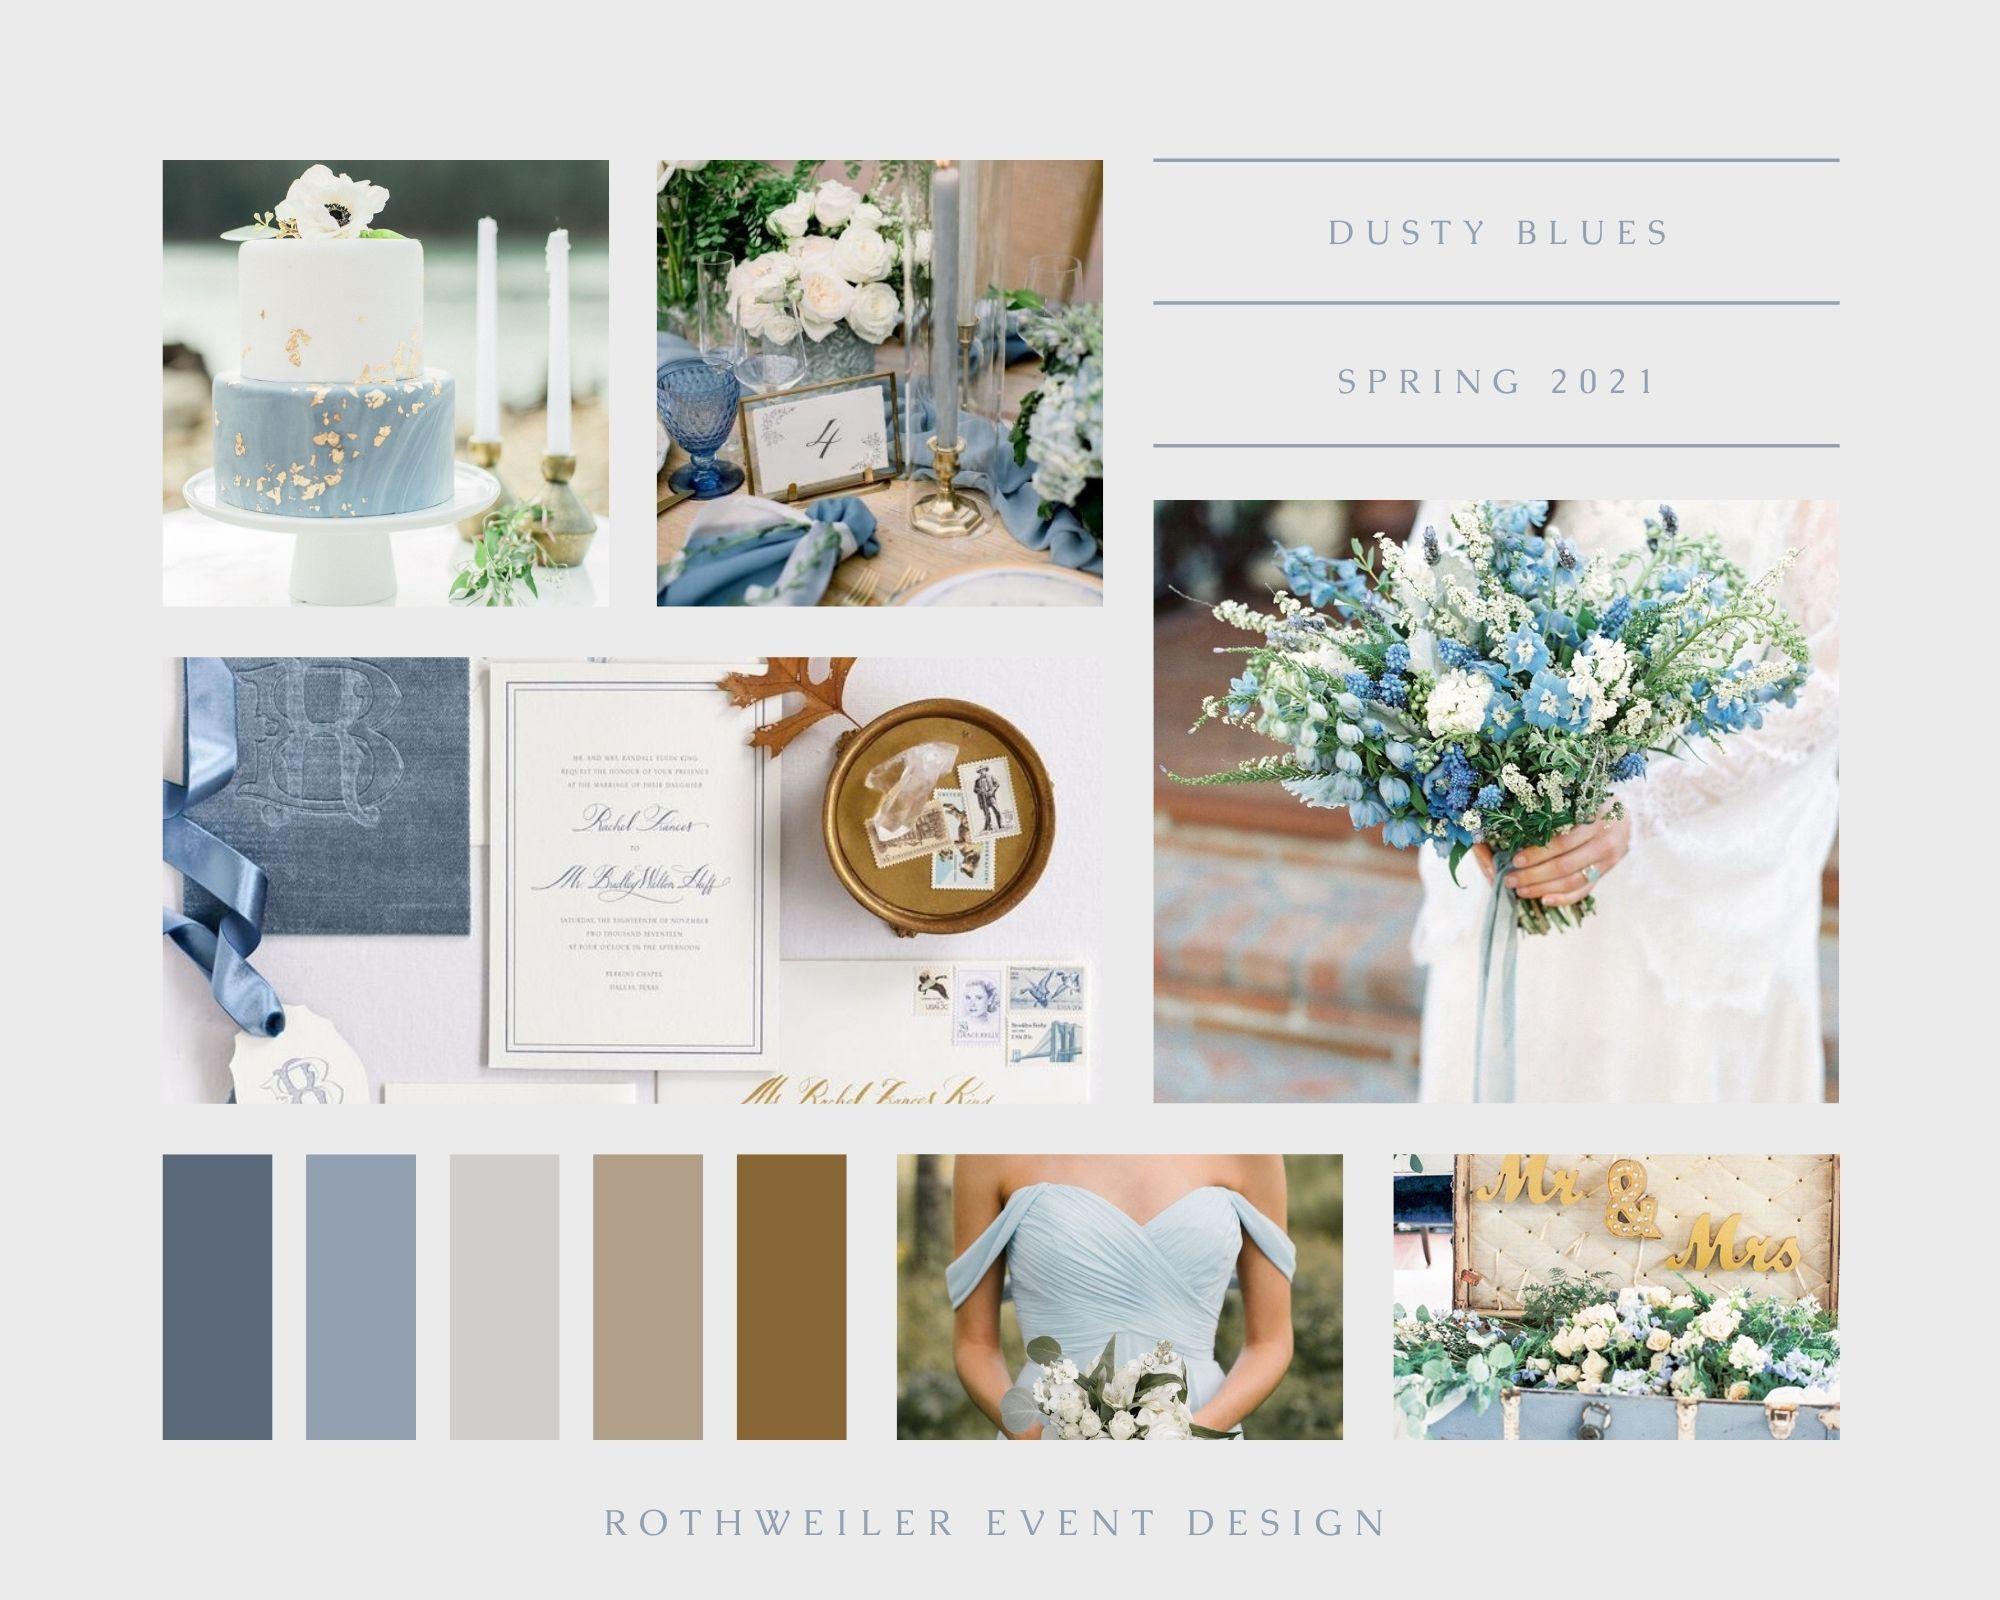 spring wedding colors 2021